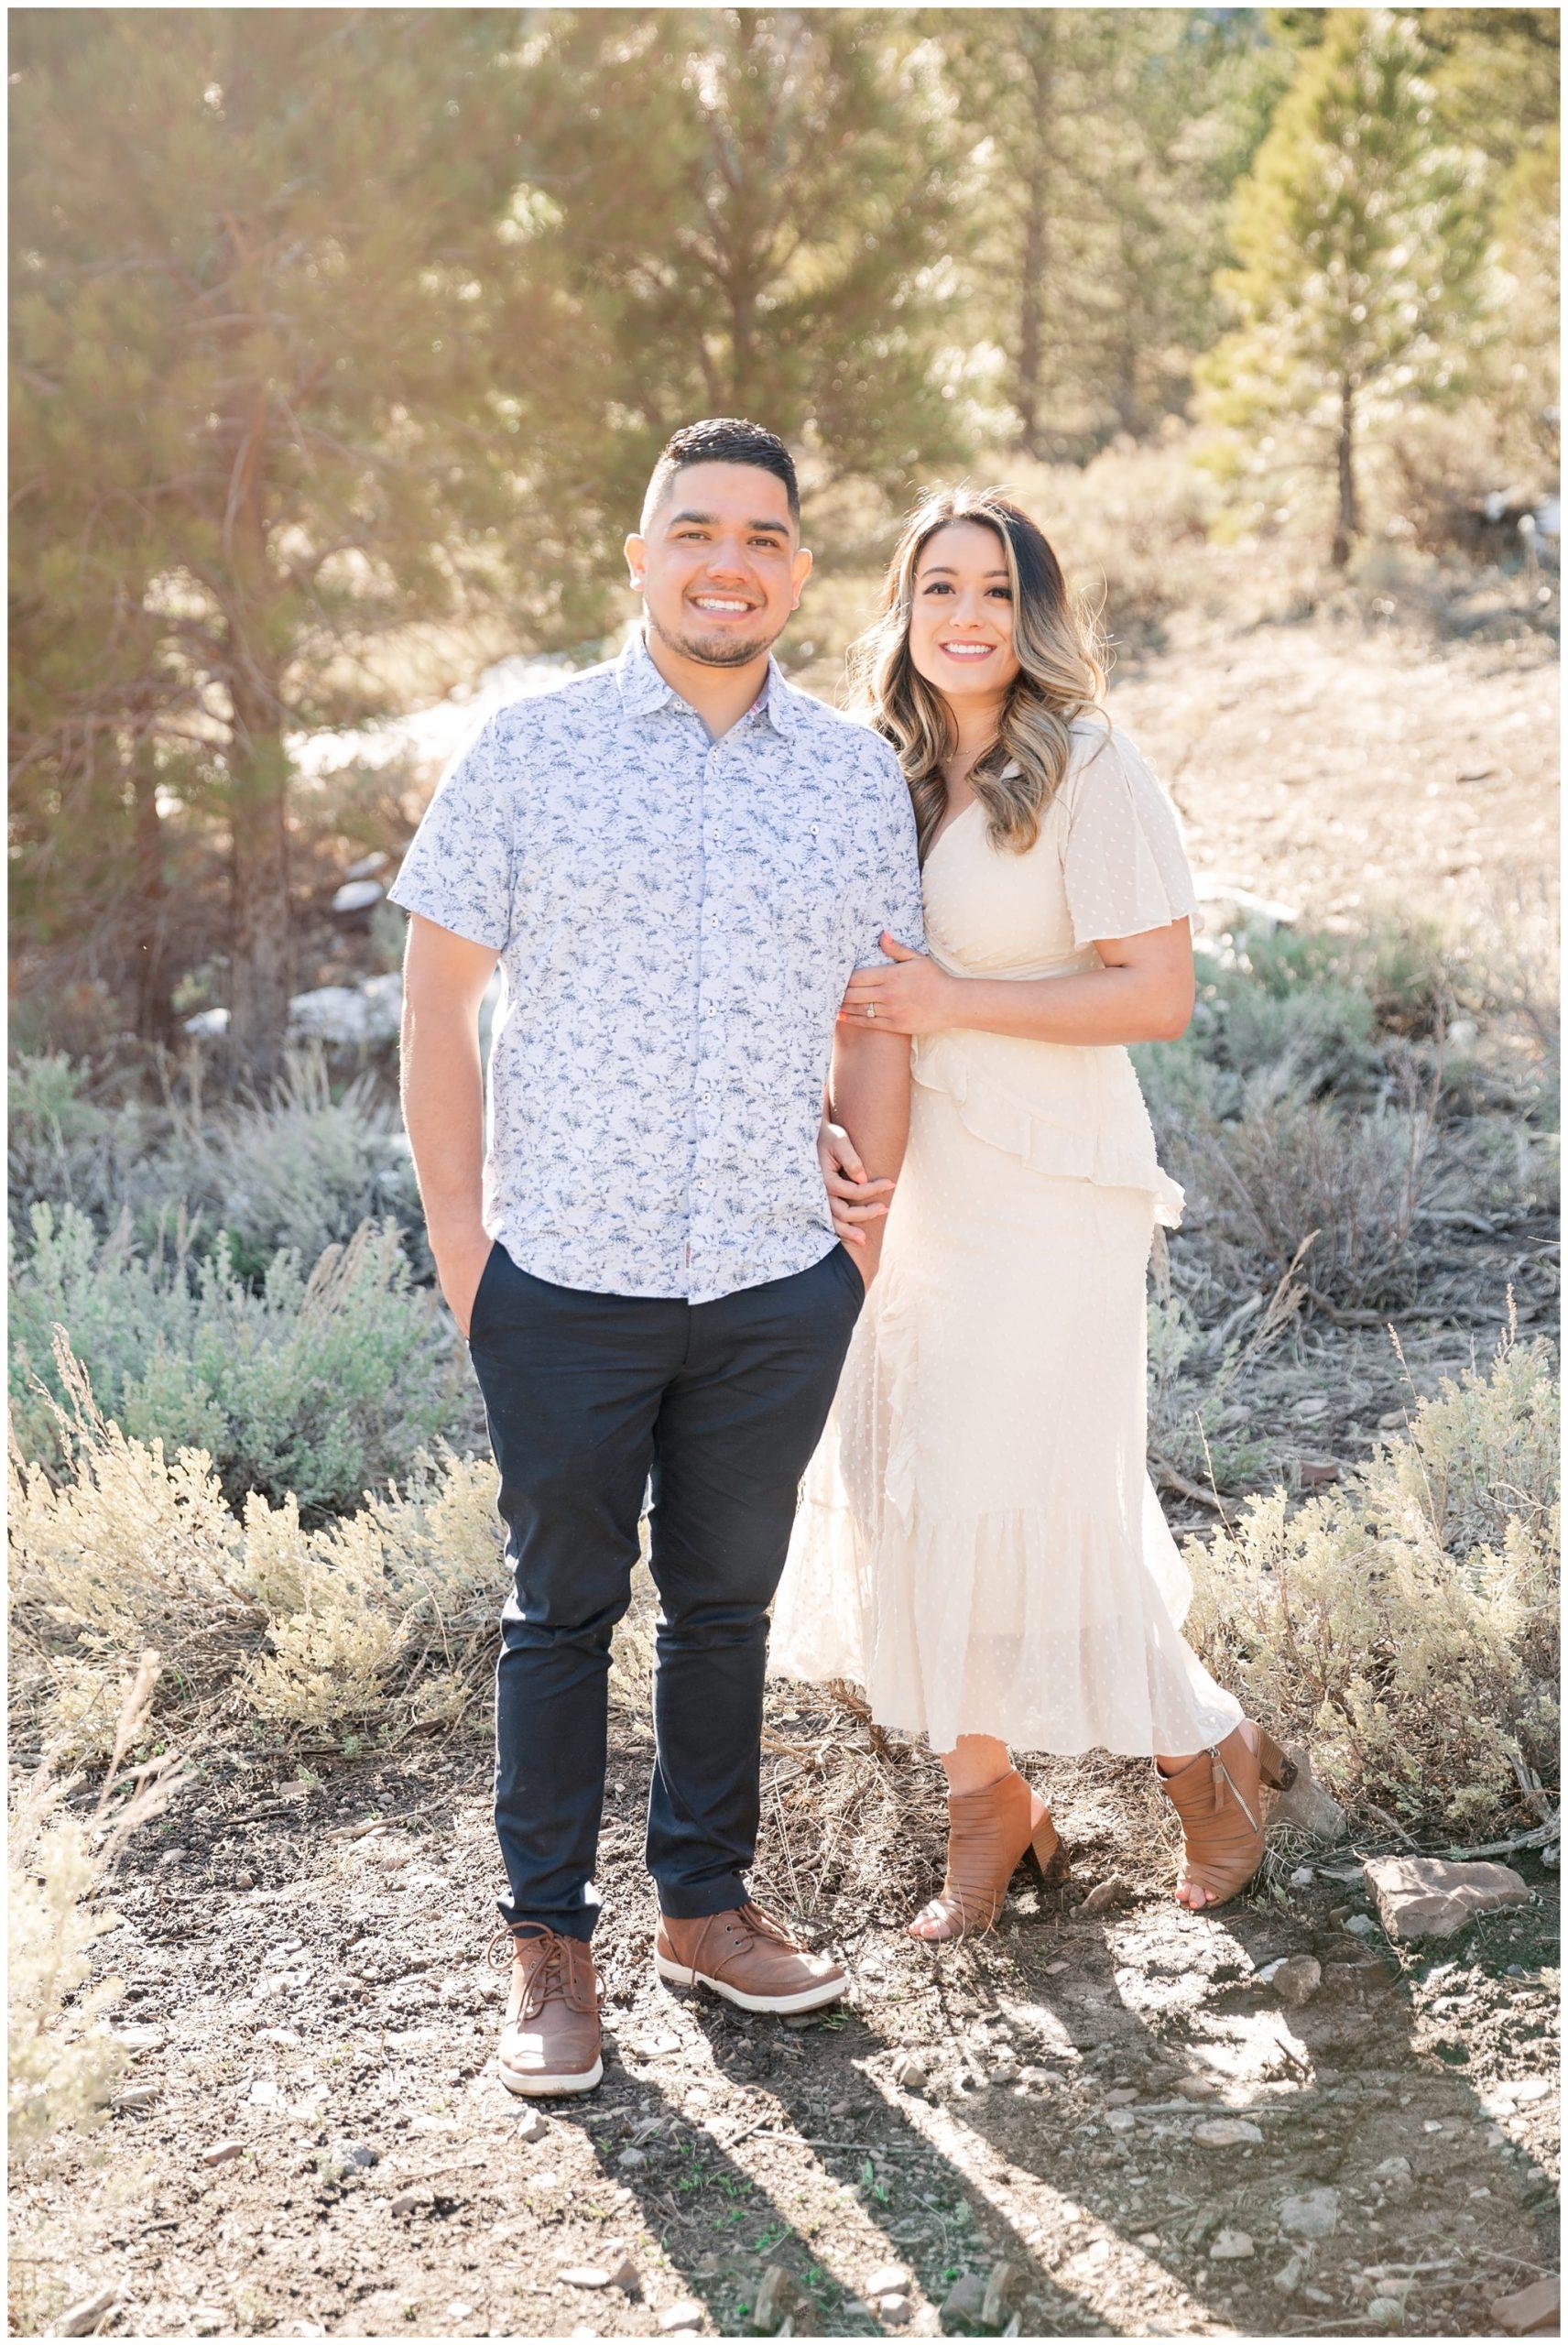 Spring Engagement session at tibble fork reservoir in Utah